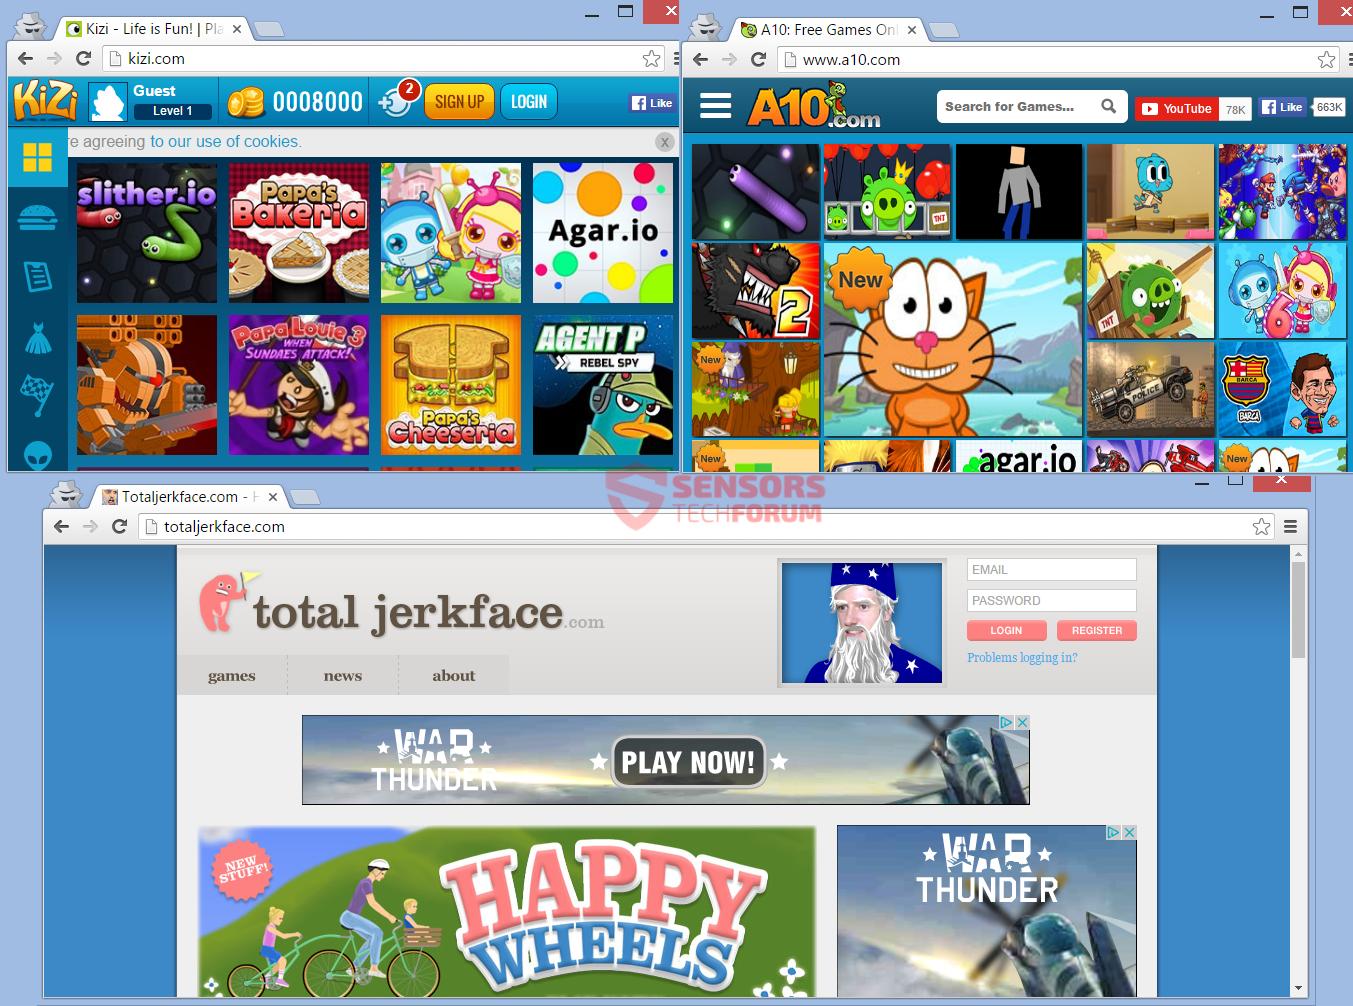 STF-gamesflight-com-games-flight-adware-ads-partner-sites